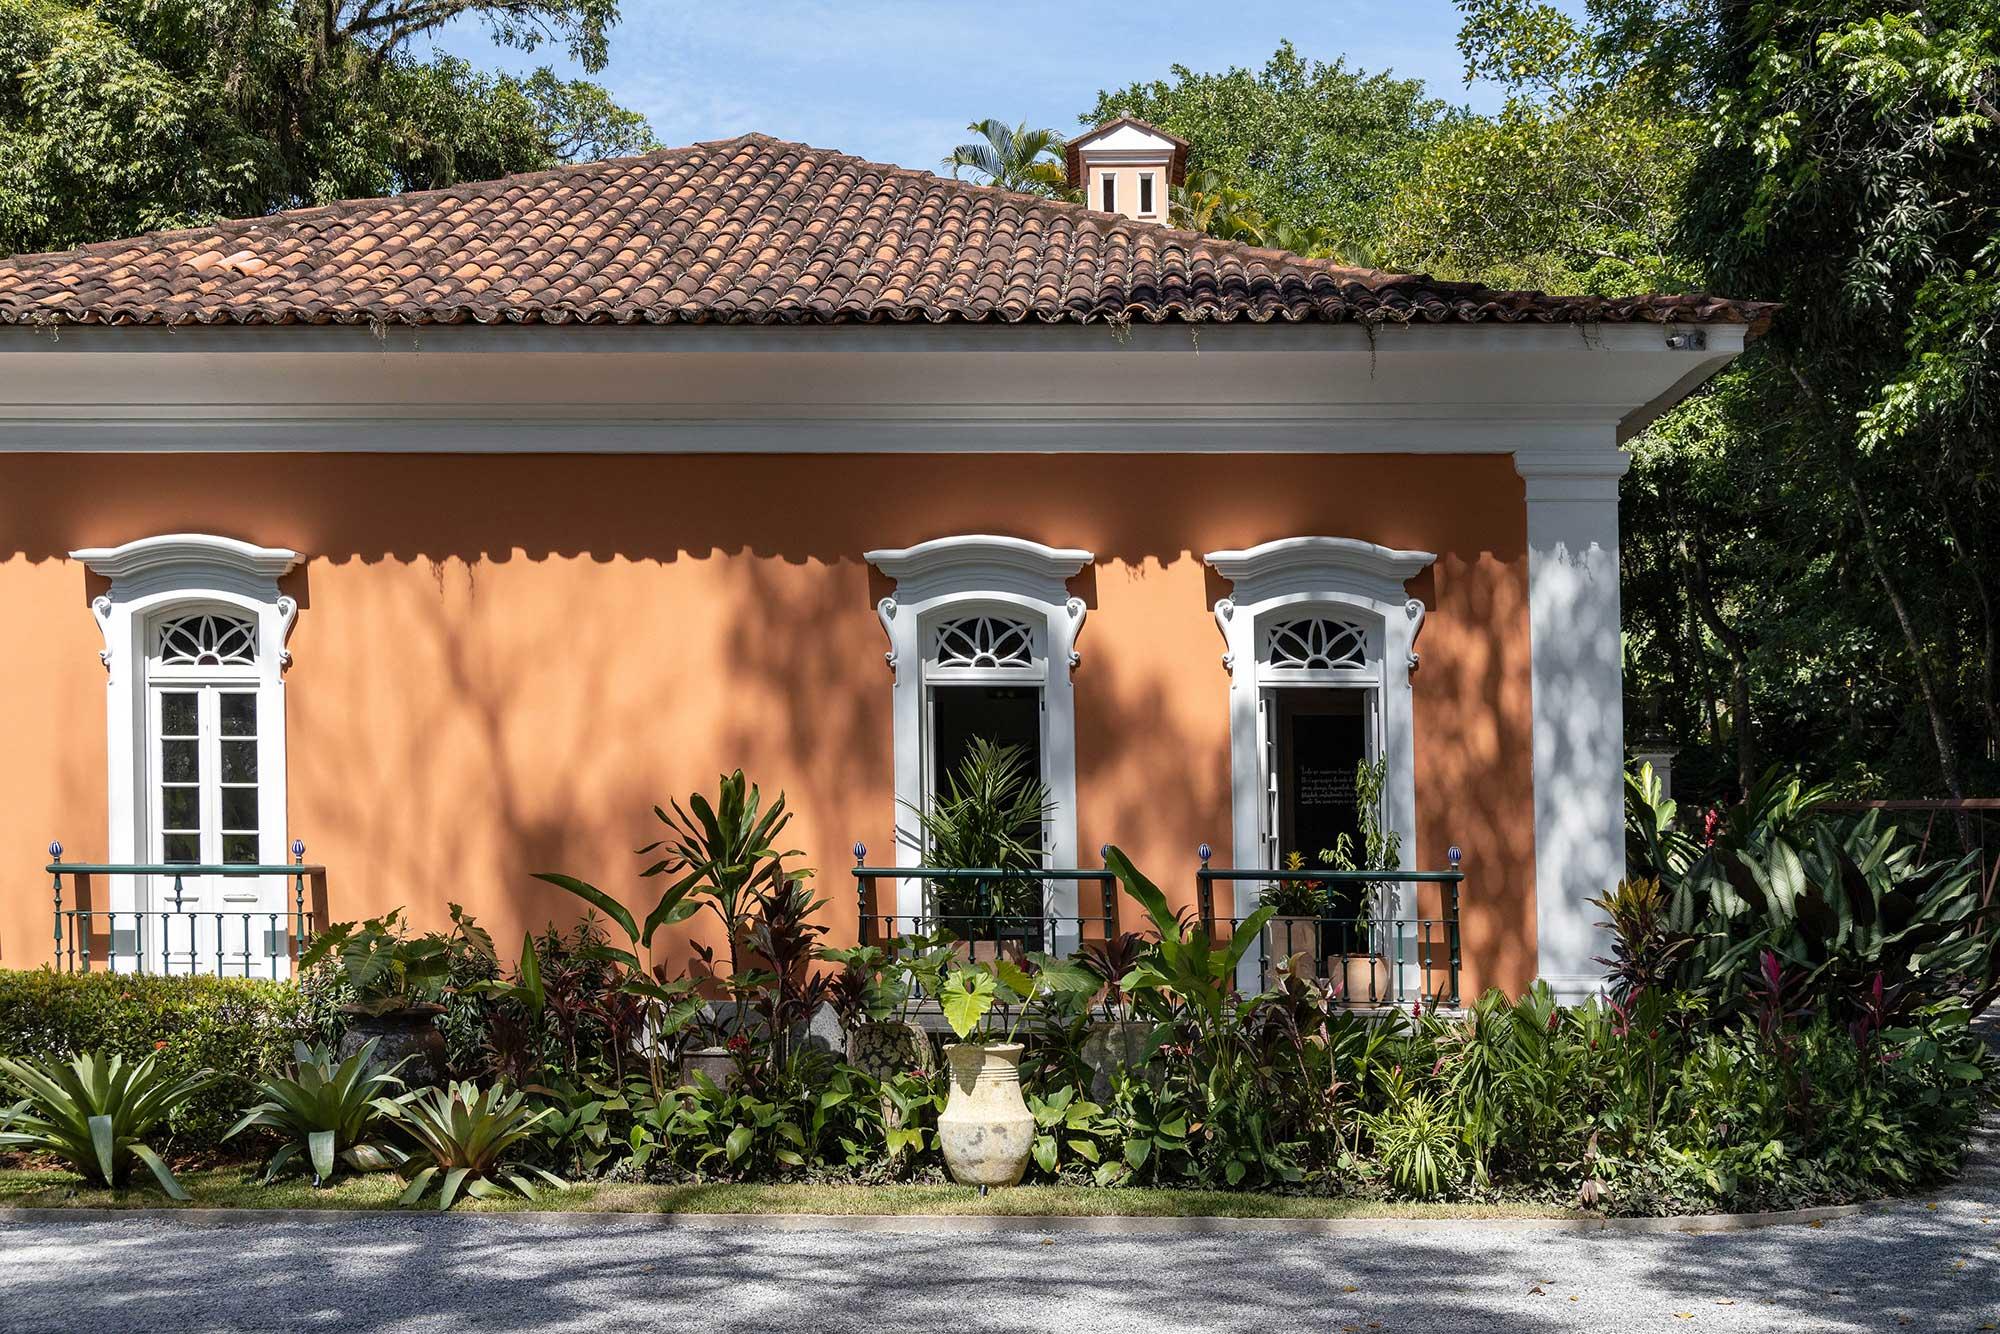 casacor rio de janeiro 2021 fachada cor coral residência brando barbosa 30 edição mostras